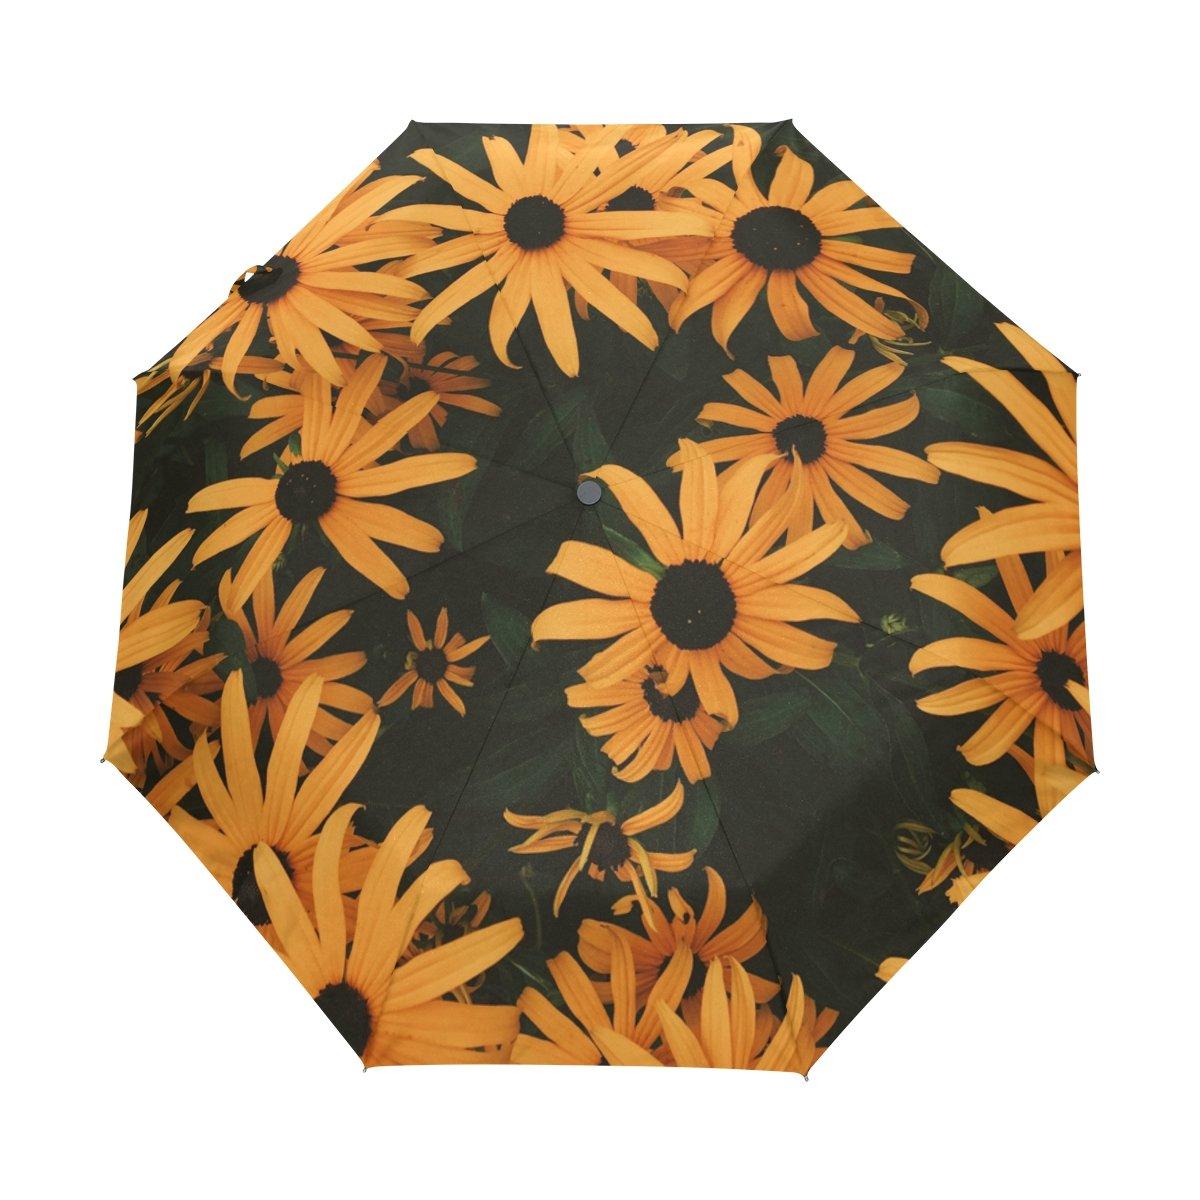 Senya Saobao防風と防雨トラベル傘ポータブル折りたたみ式で自動開いて閉じ折りたたみ明るいひまわり太陽雨傘 B07FP4KCJN